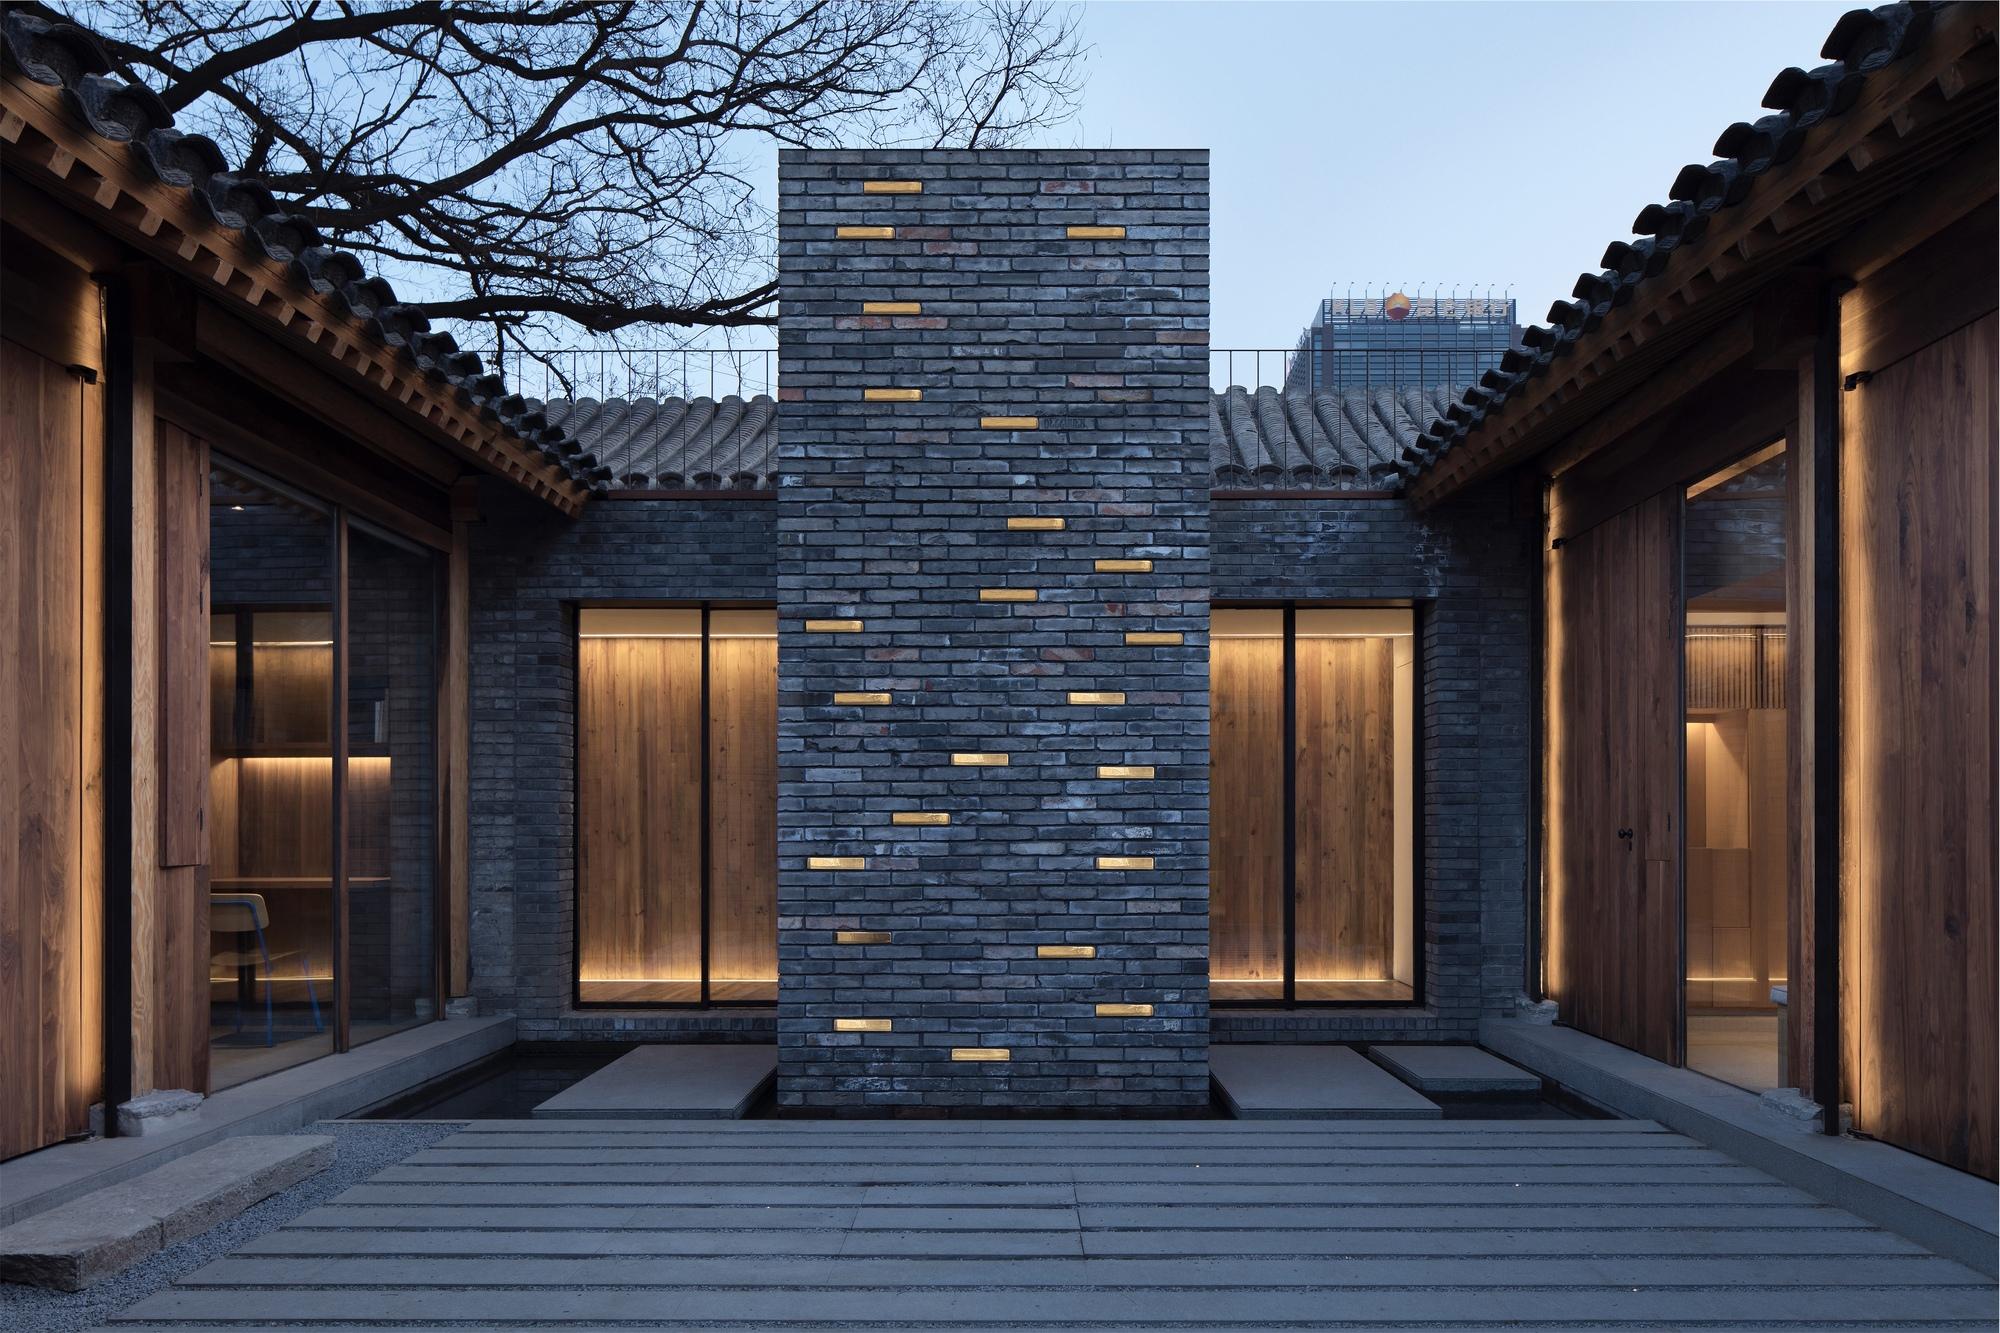 White Pagoda Temple Hutong Courtyard Renovation / B.L.U.E. Architecture Studio